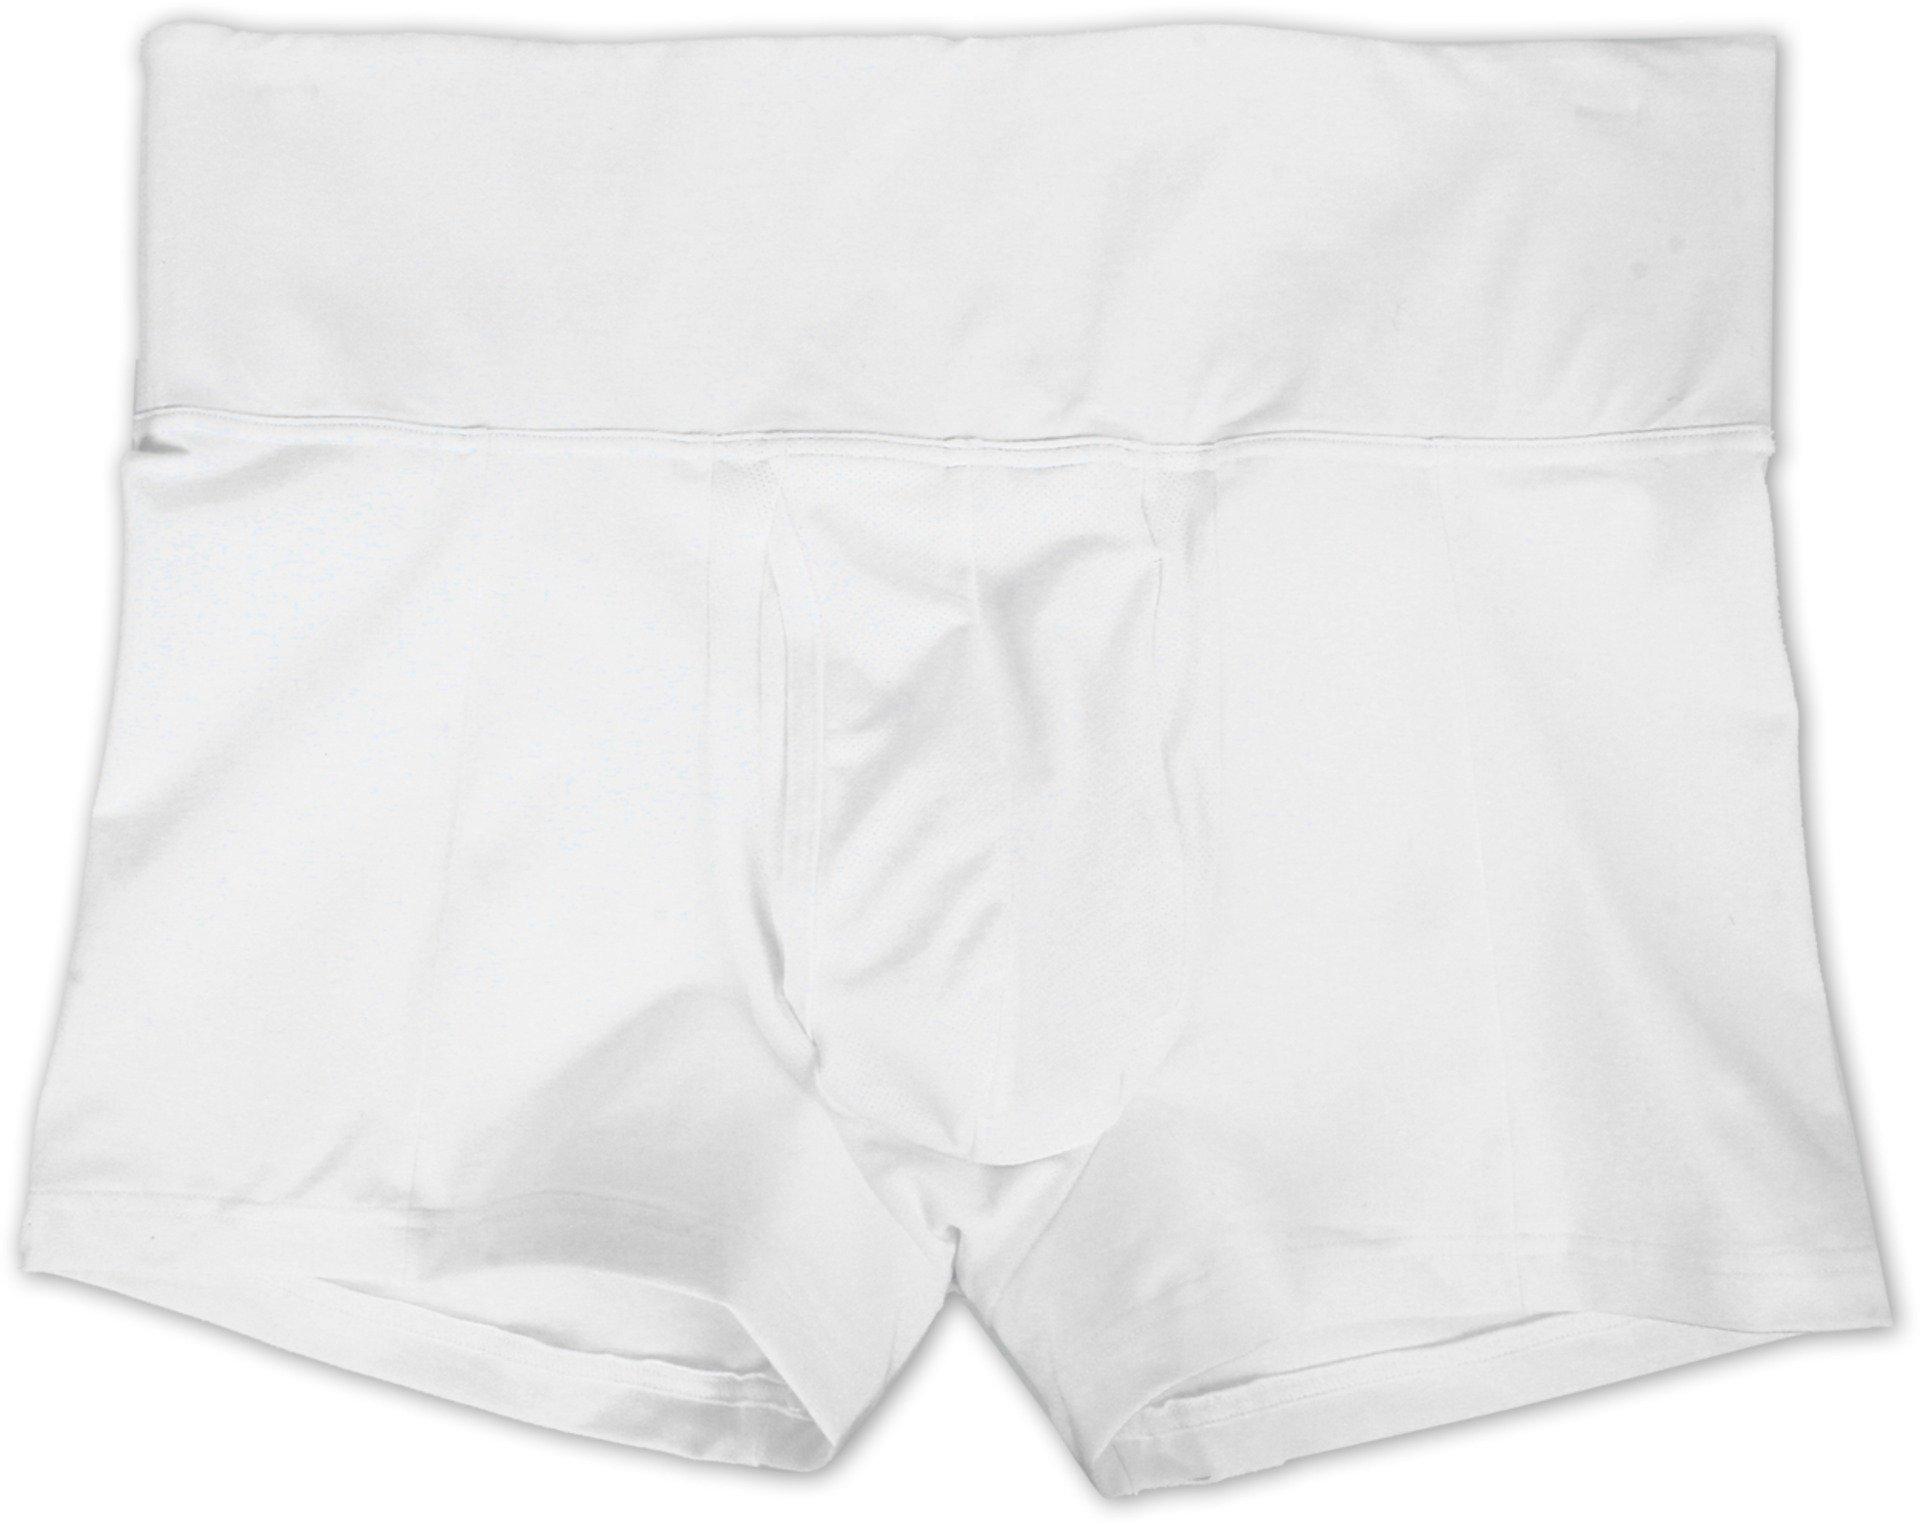 SPANX for Men Men's Slim-Waist Trunk, White, LG by SPANX